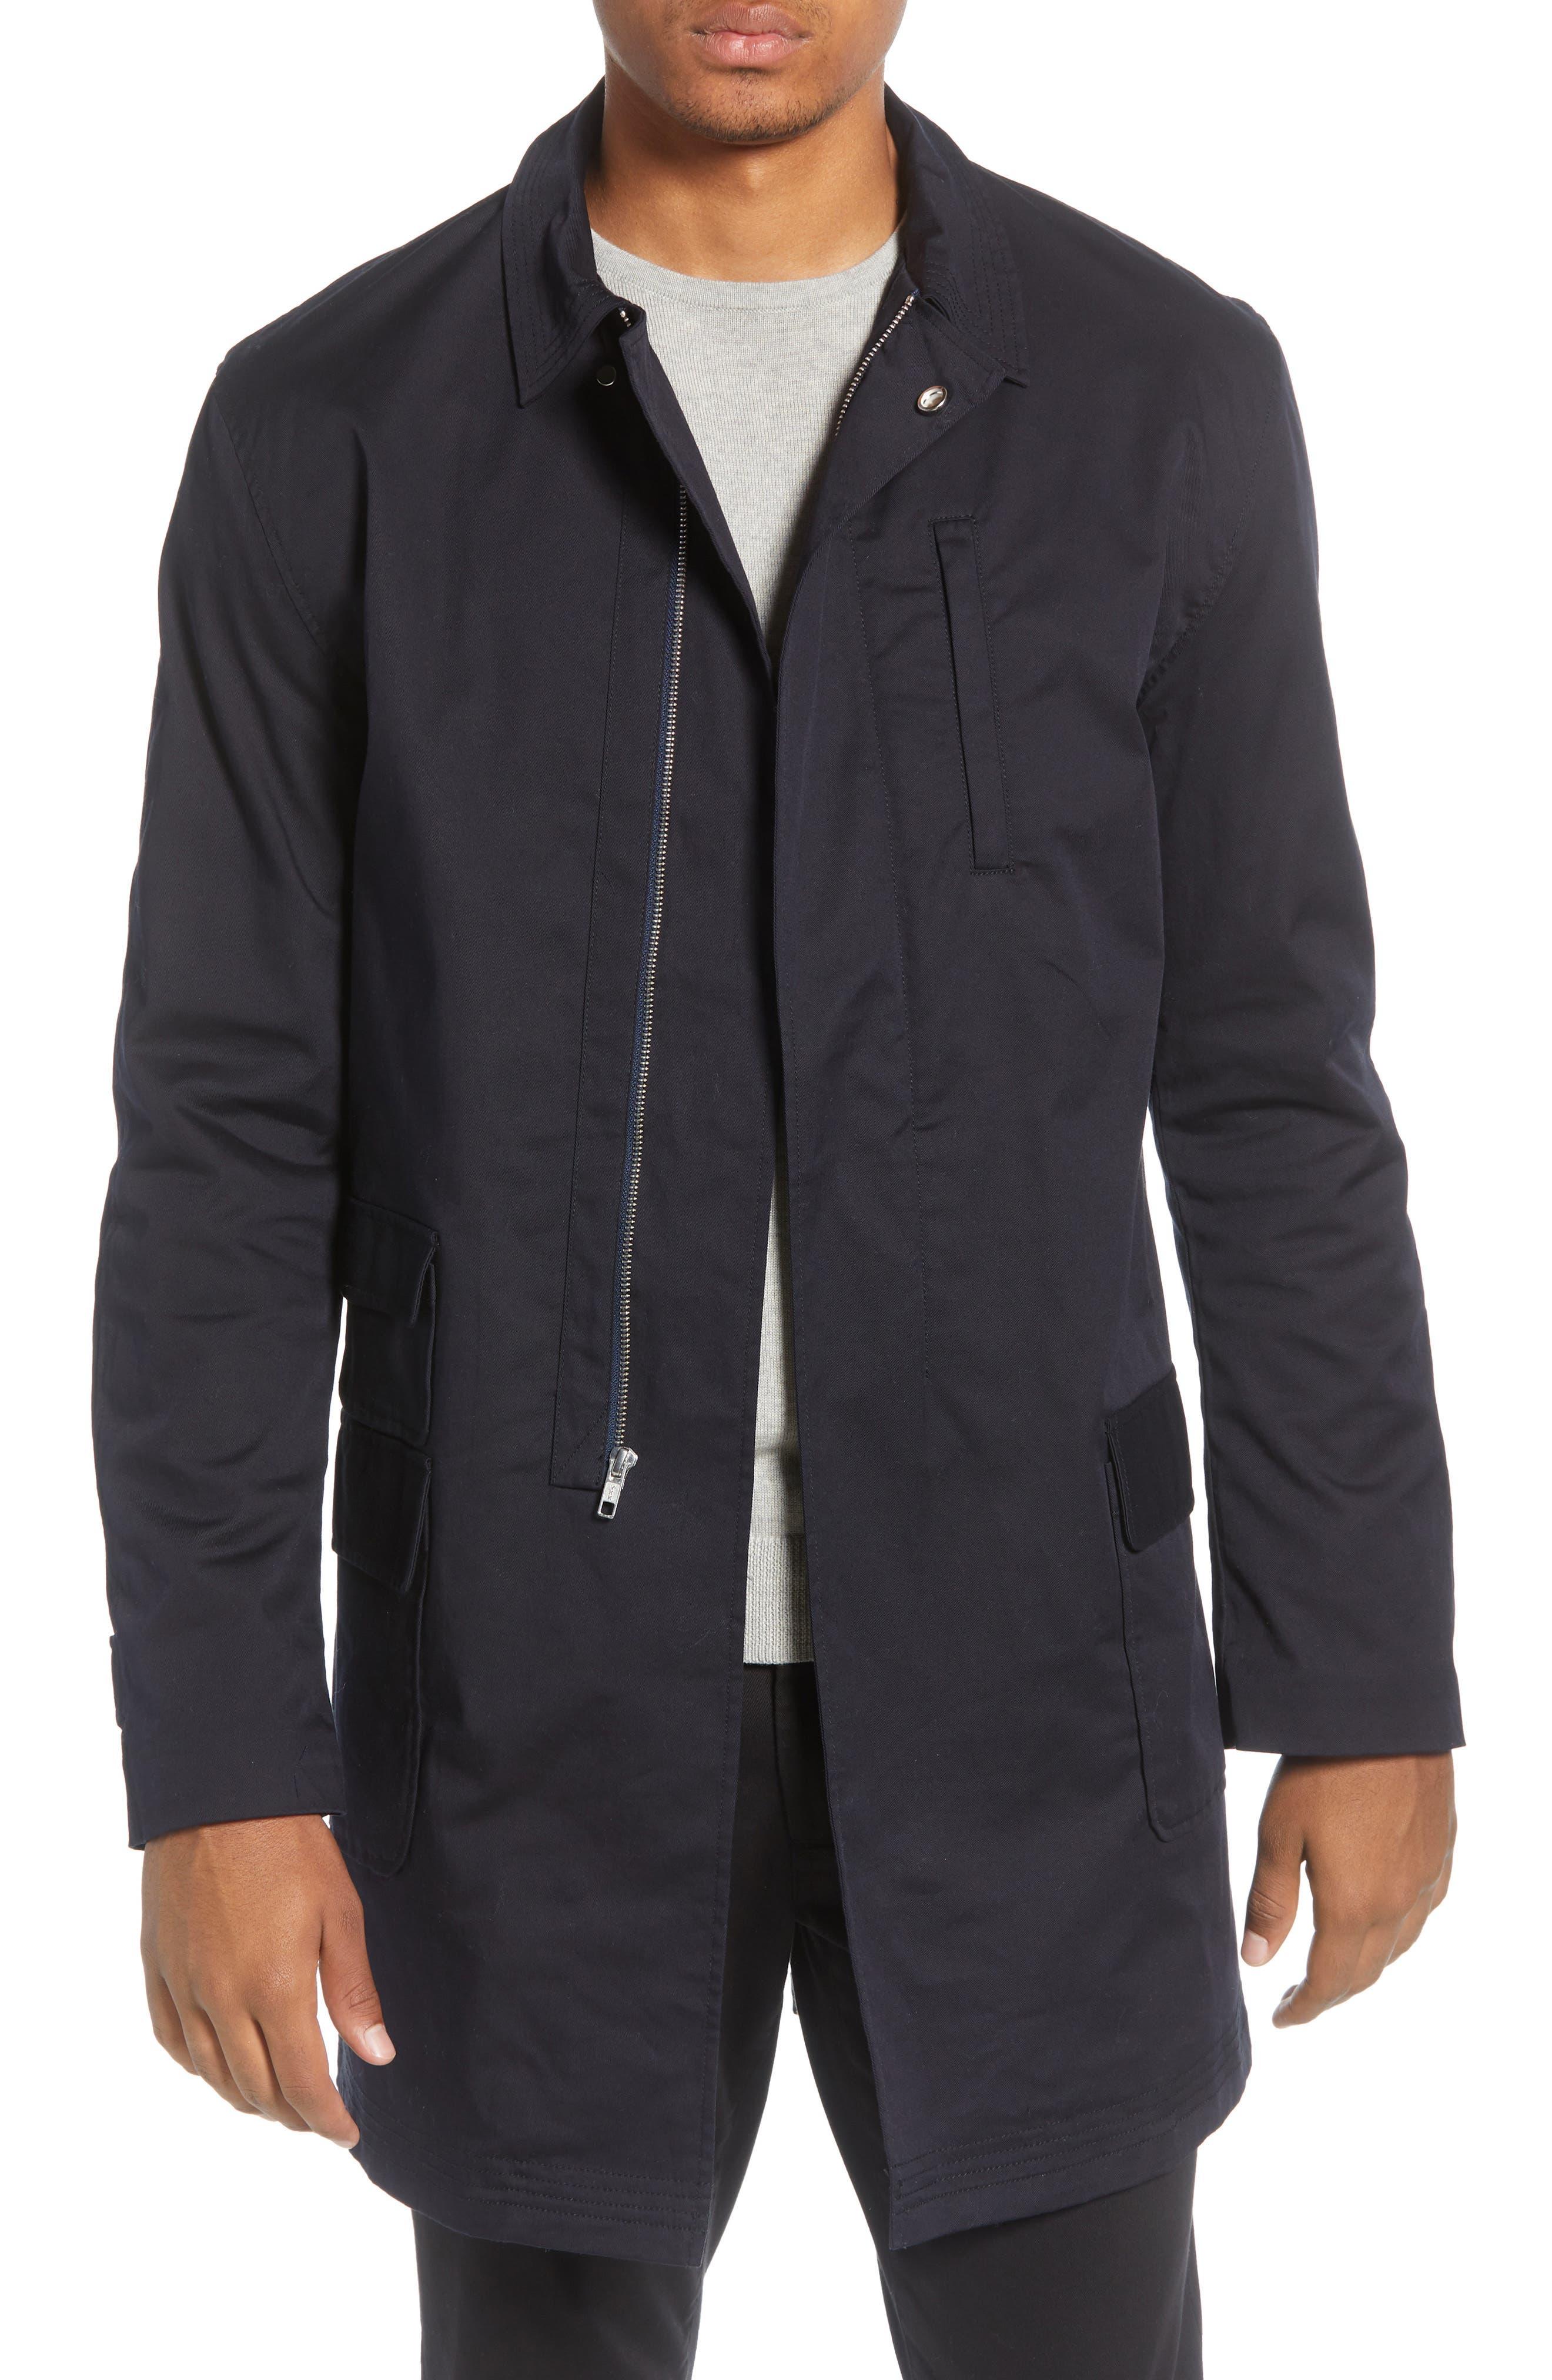 Image of BLDWN Decker Regular Fit Water Repellent Jacket